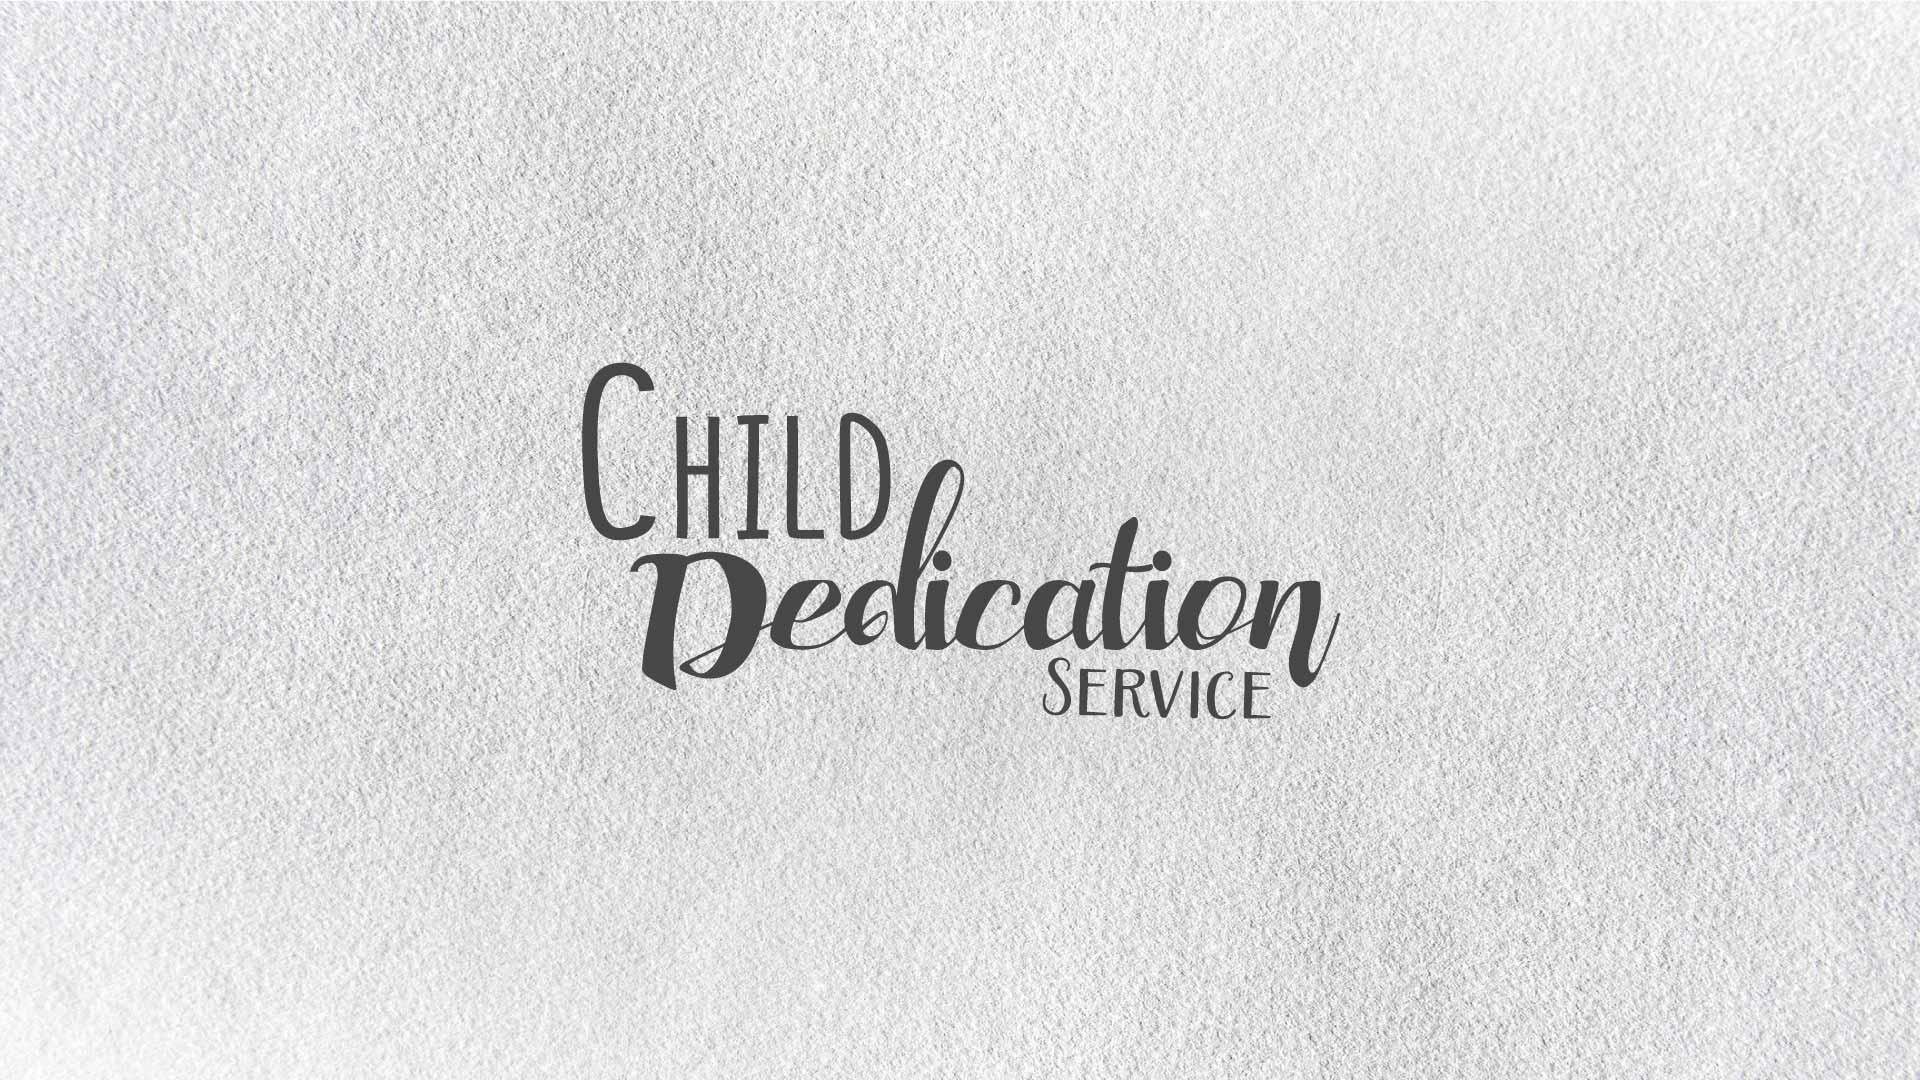 170607 child dedication service 16x9